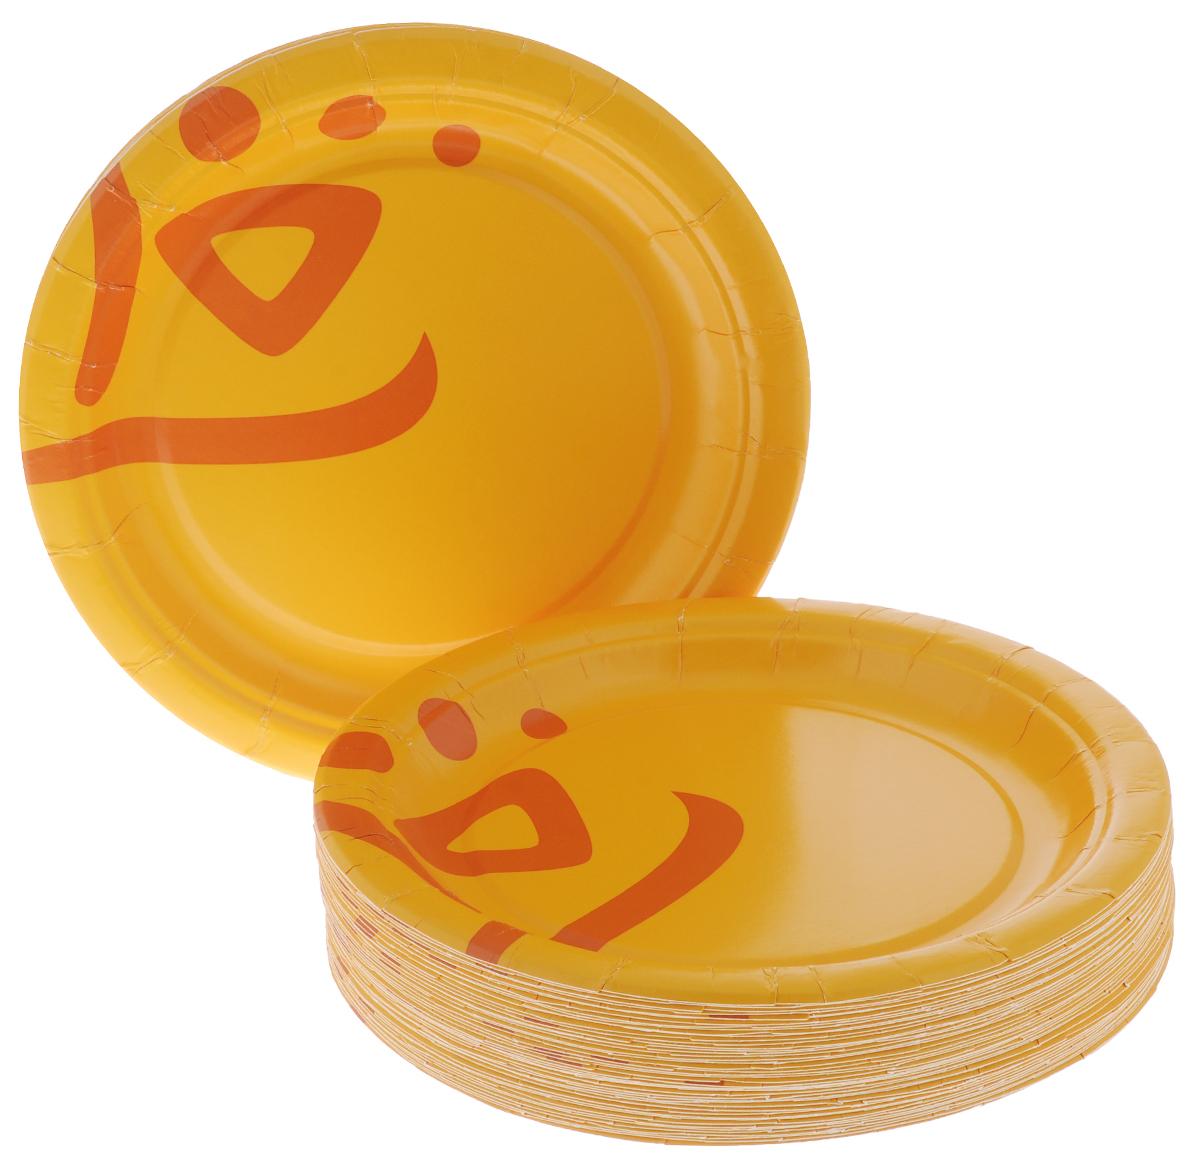 Набор одноразовых тарелок Huhtamaki Whizz, цвет: оранжевый, диаметр 23 см, 50 шт